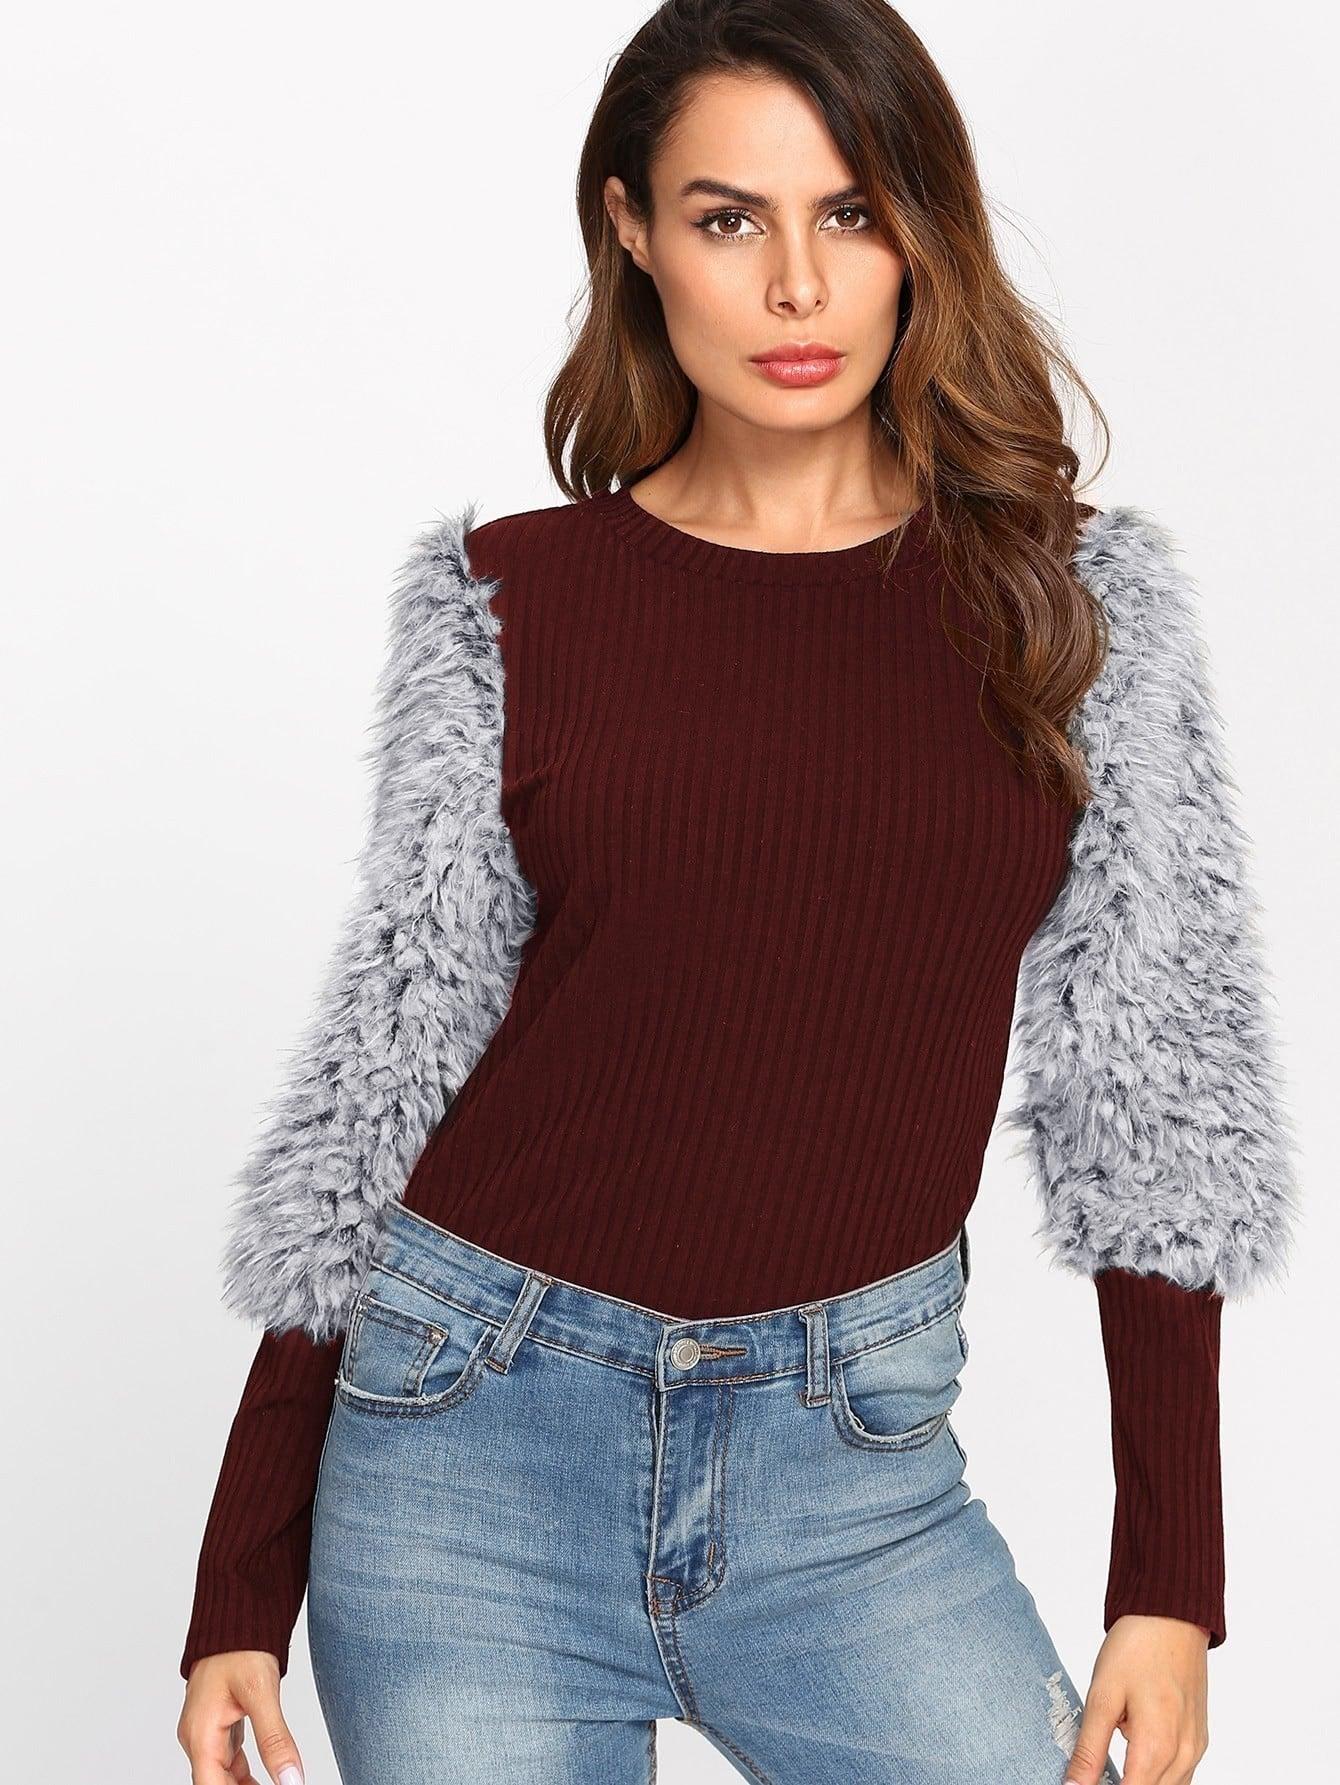 Rib Knit T-shirt With Faux Fur Sleeve cutout front rib knit t shirt